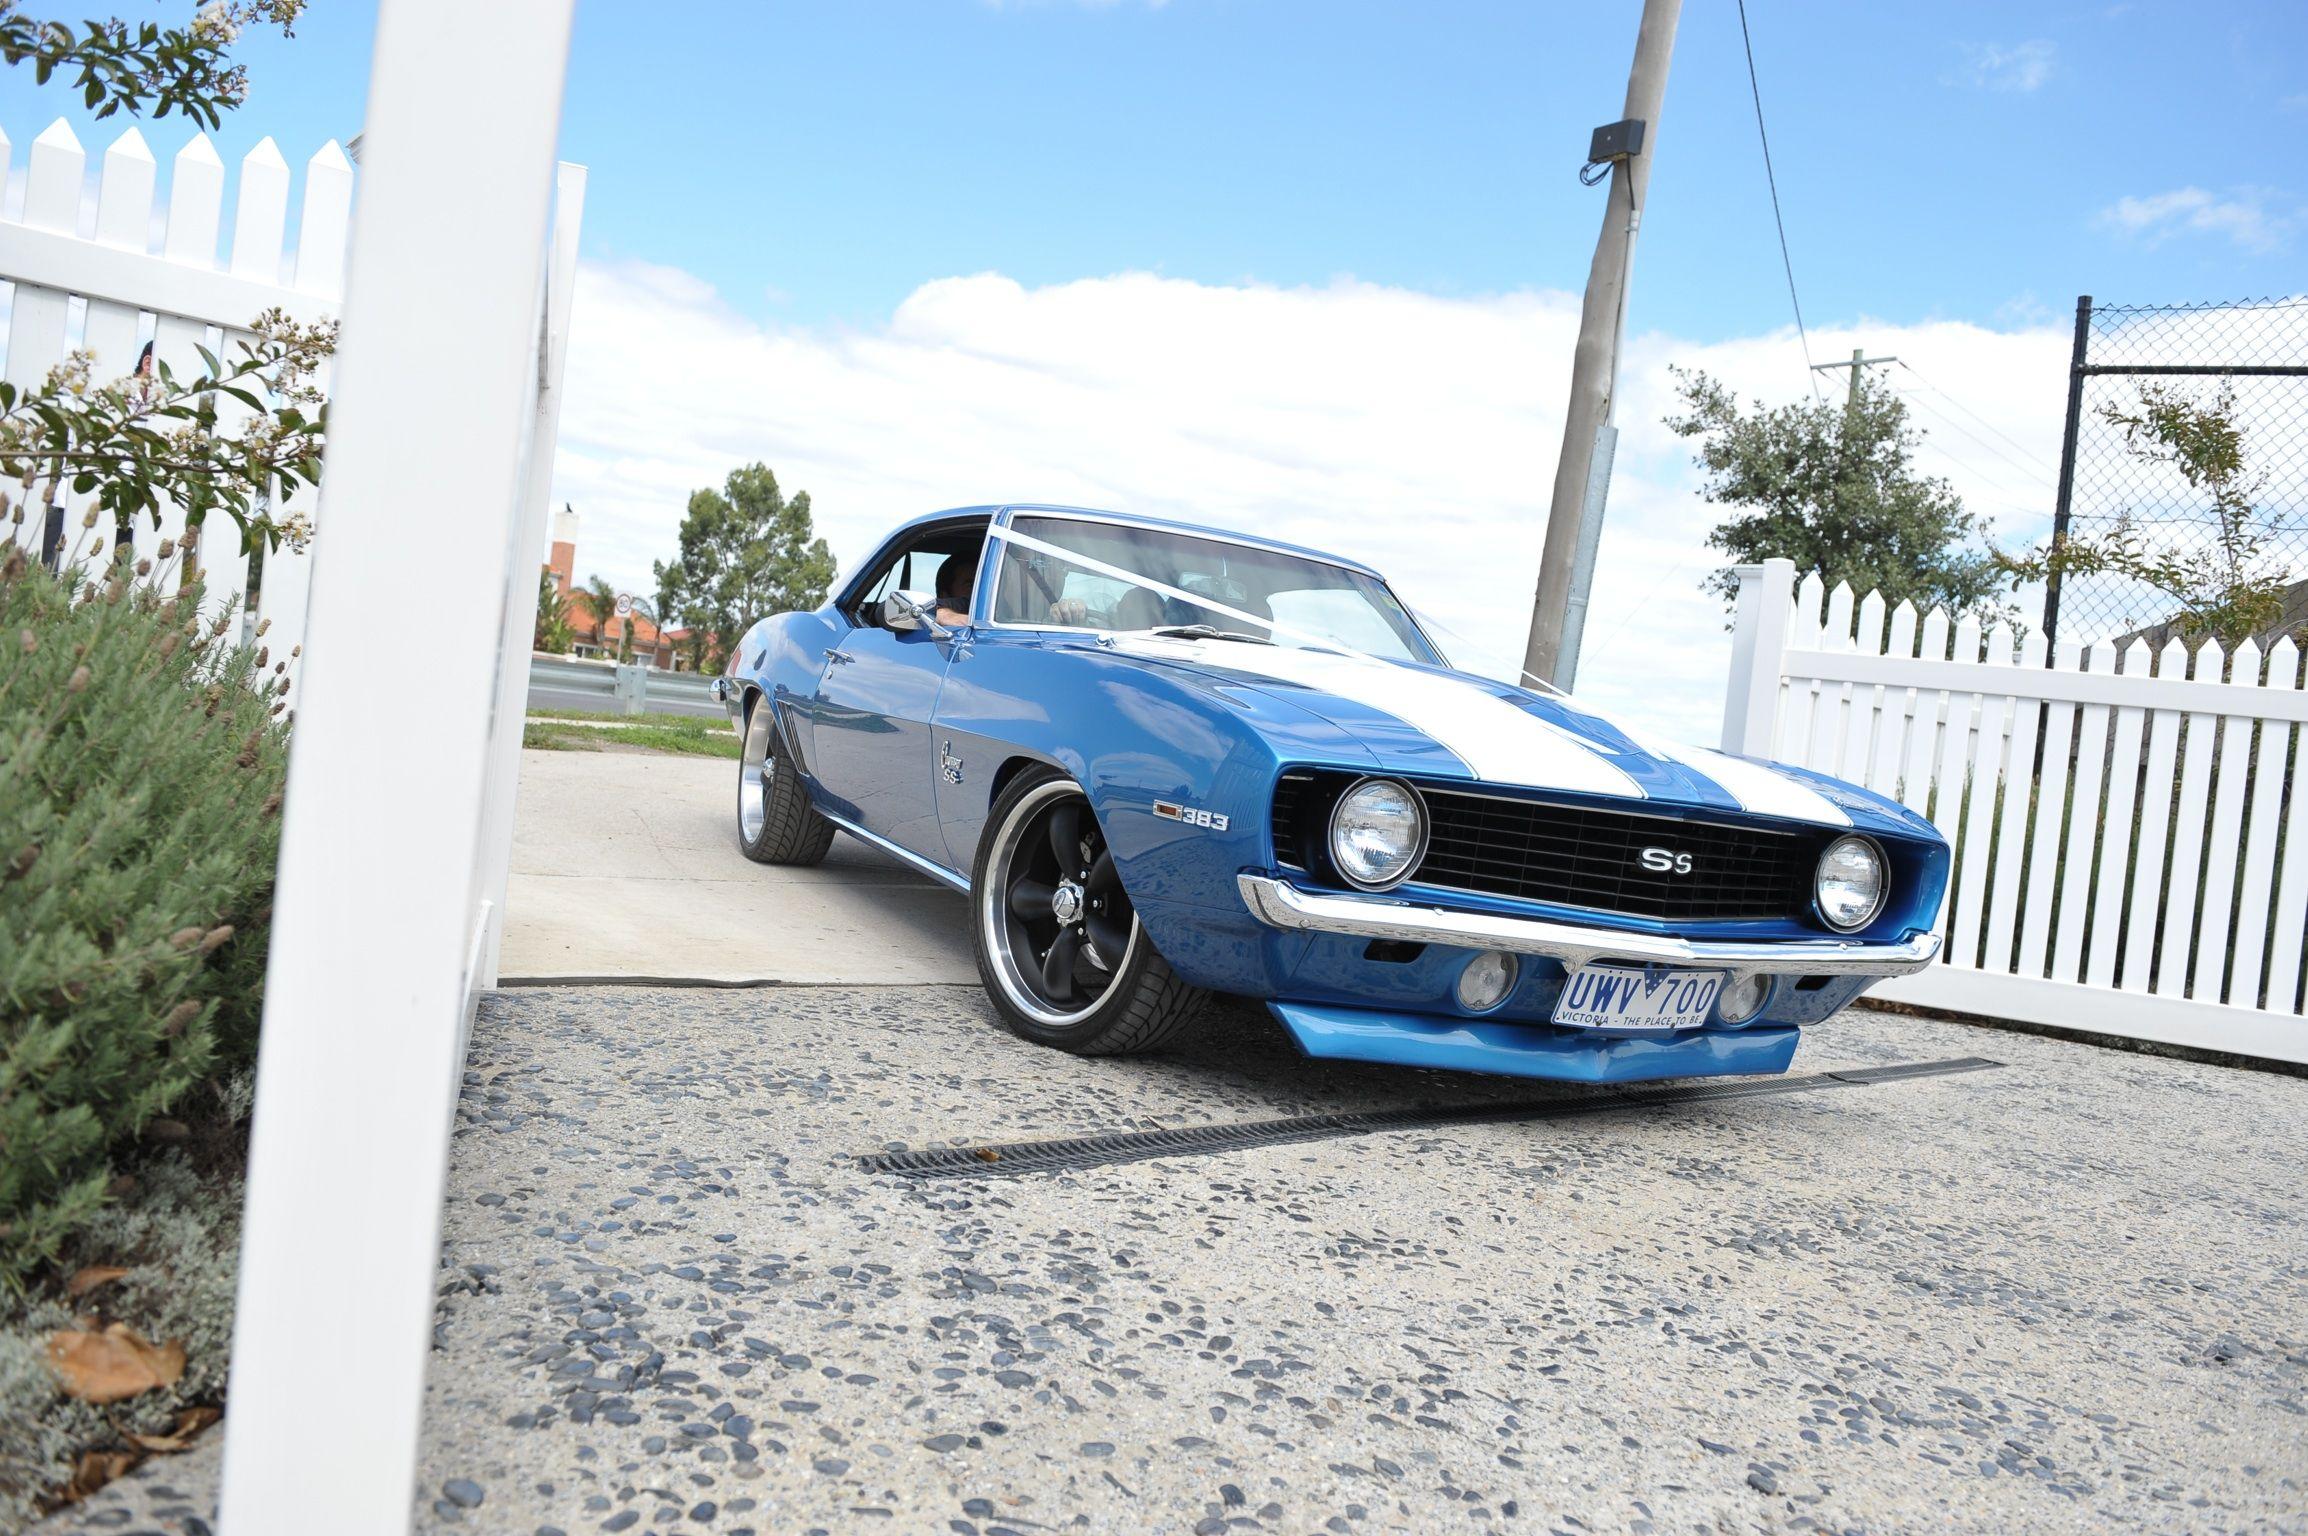 Blue 69 Camaro, classic muscle car modern wedding car | Superb ...